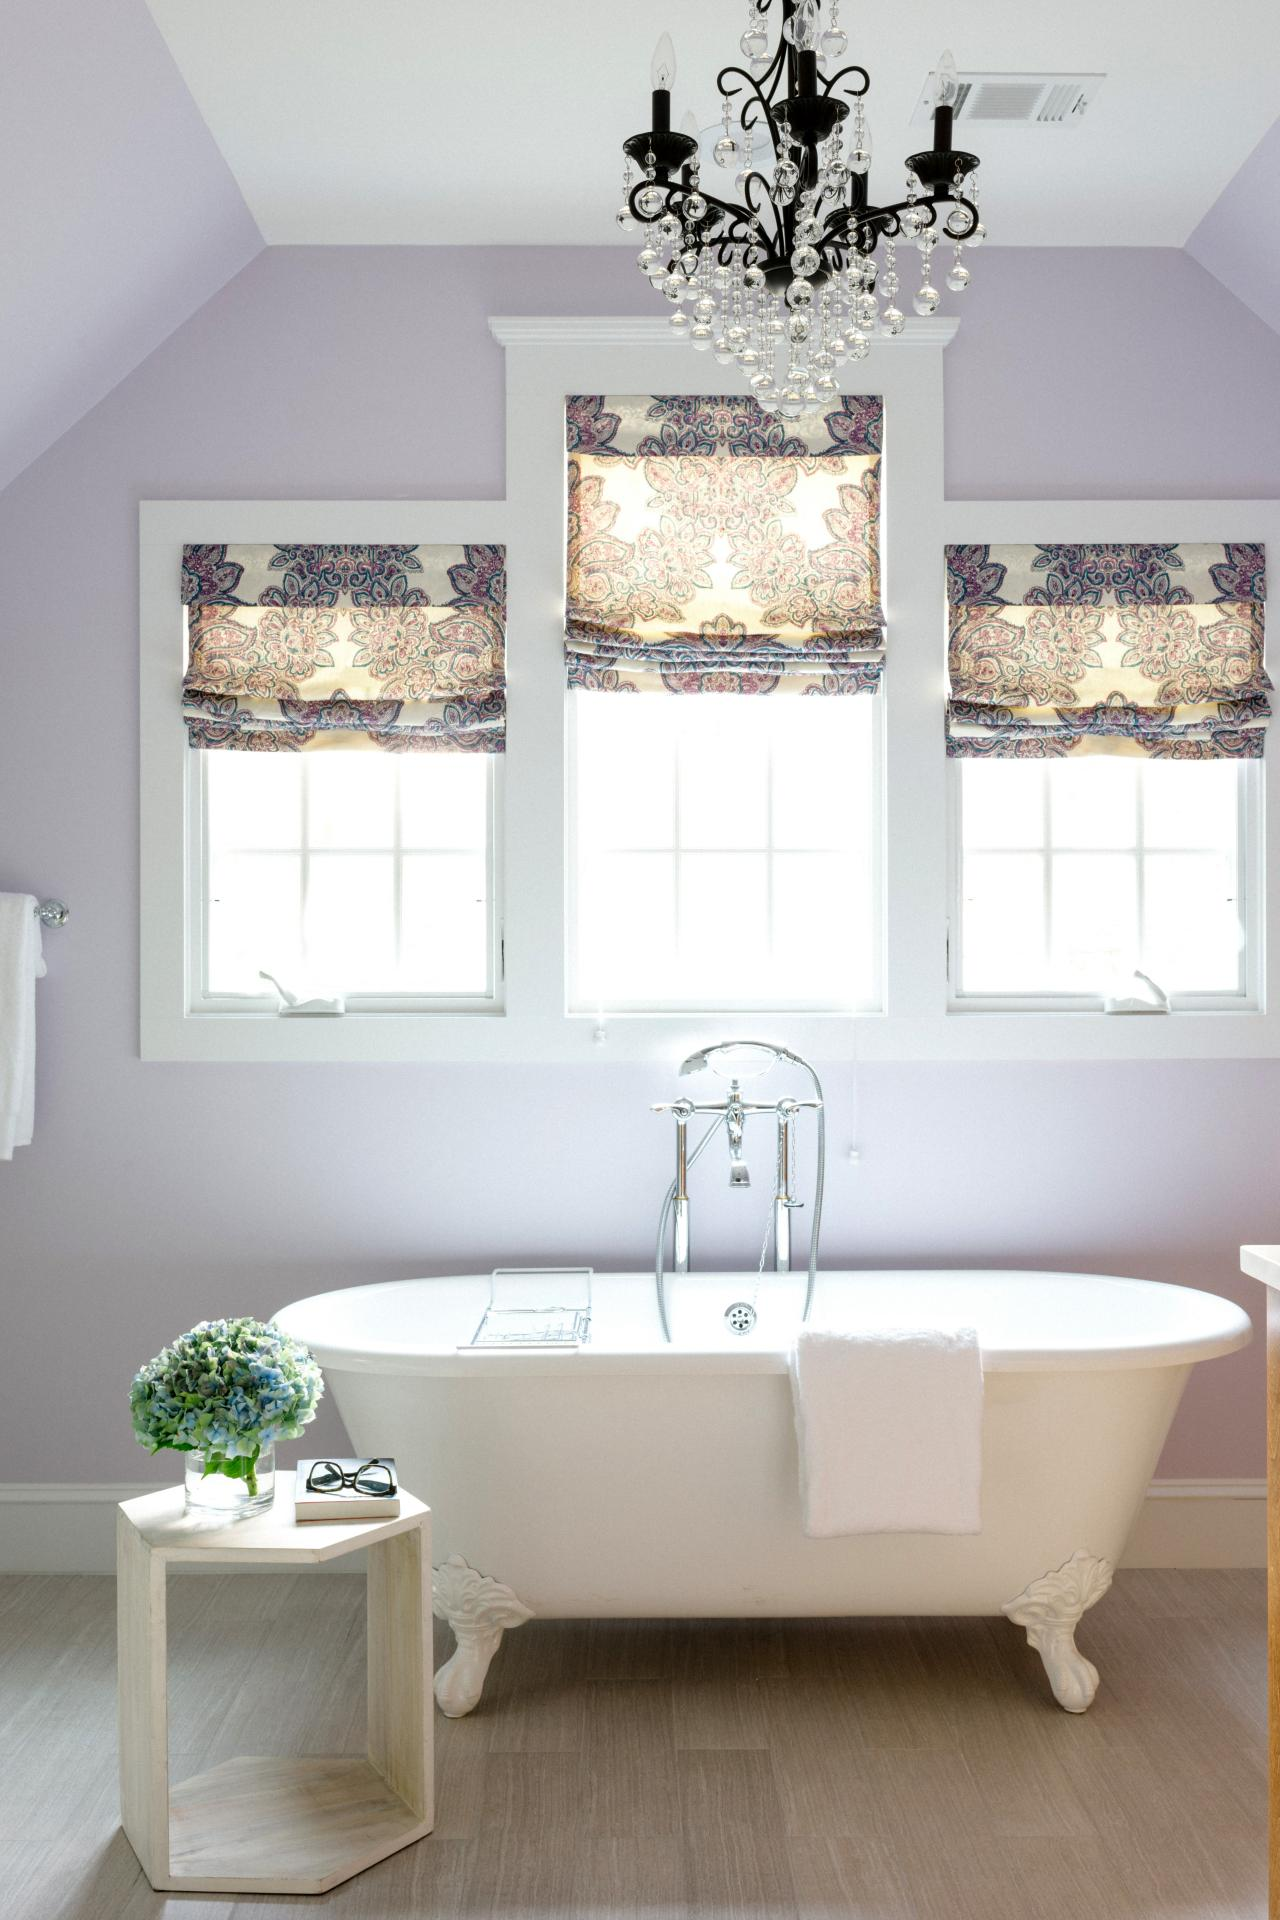 Claw Foot Tub In Light Purple Master Bathroom Hgtv